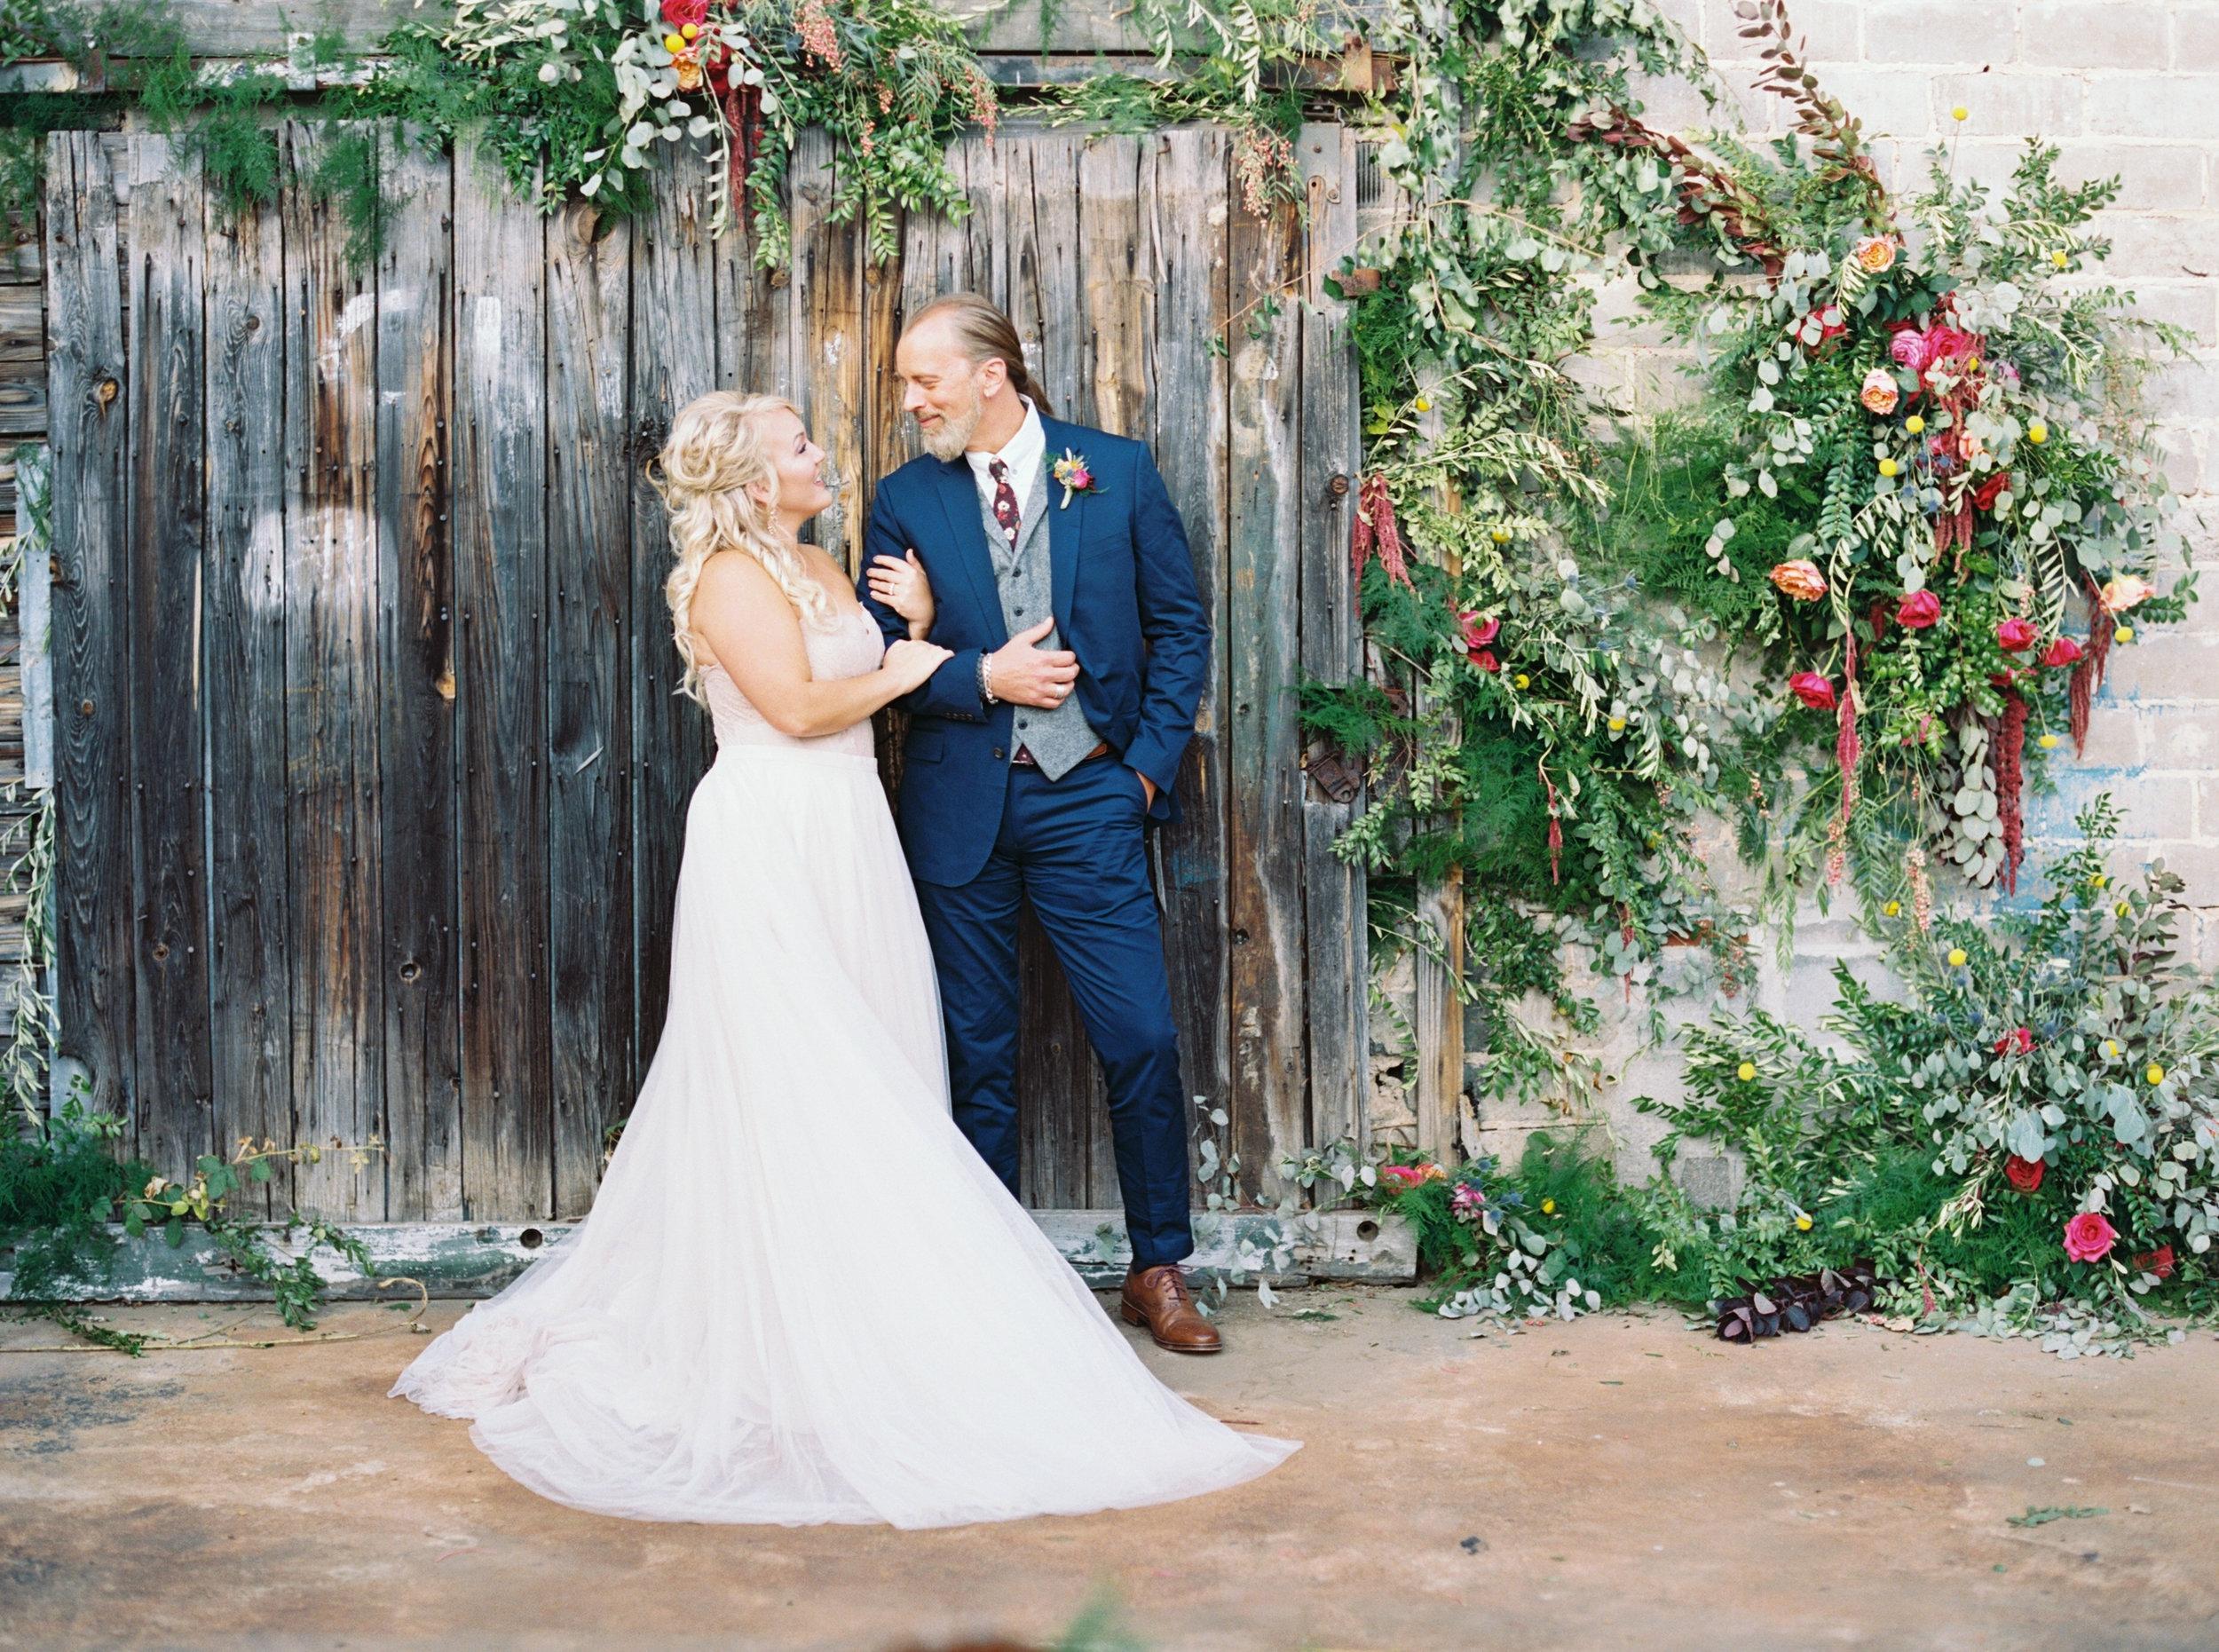 Mandi_Oliver_Chattanooga_Wedding_Abigail_Malone_Photography_Film-314.jpg